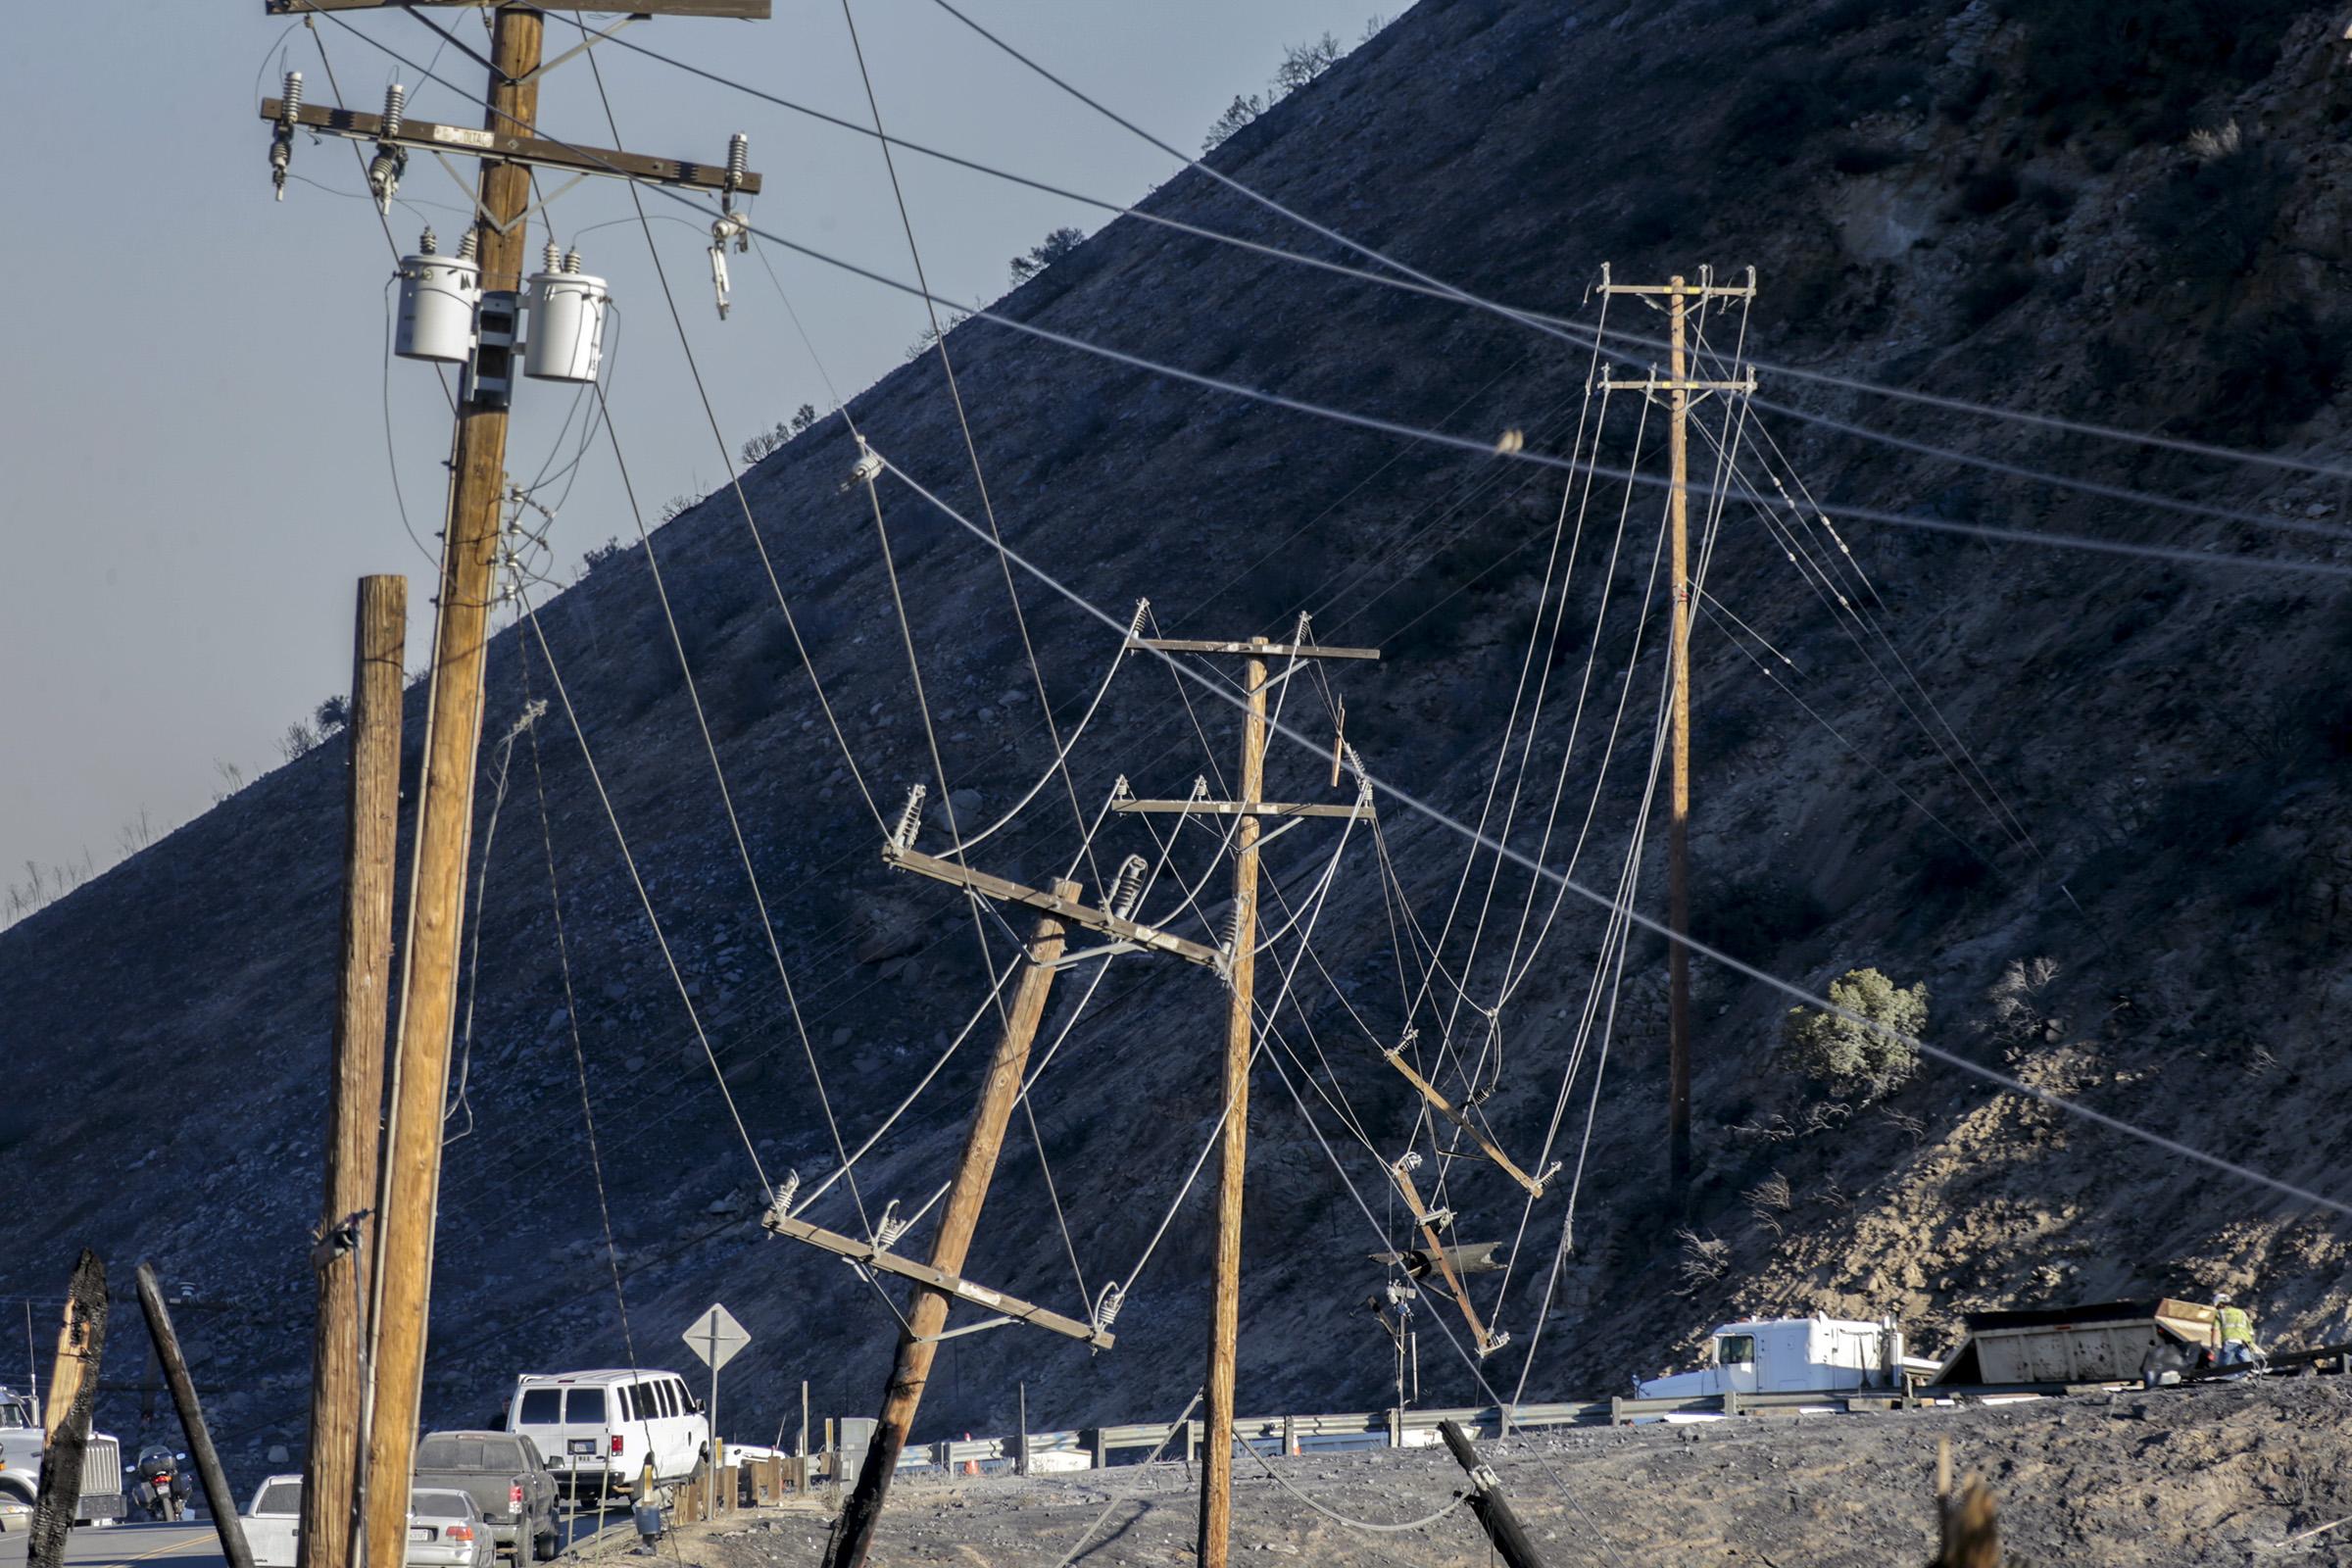 California already has among nation's highest utility rates